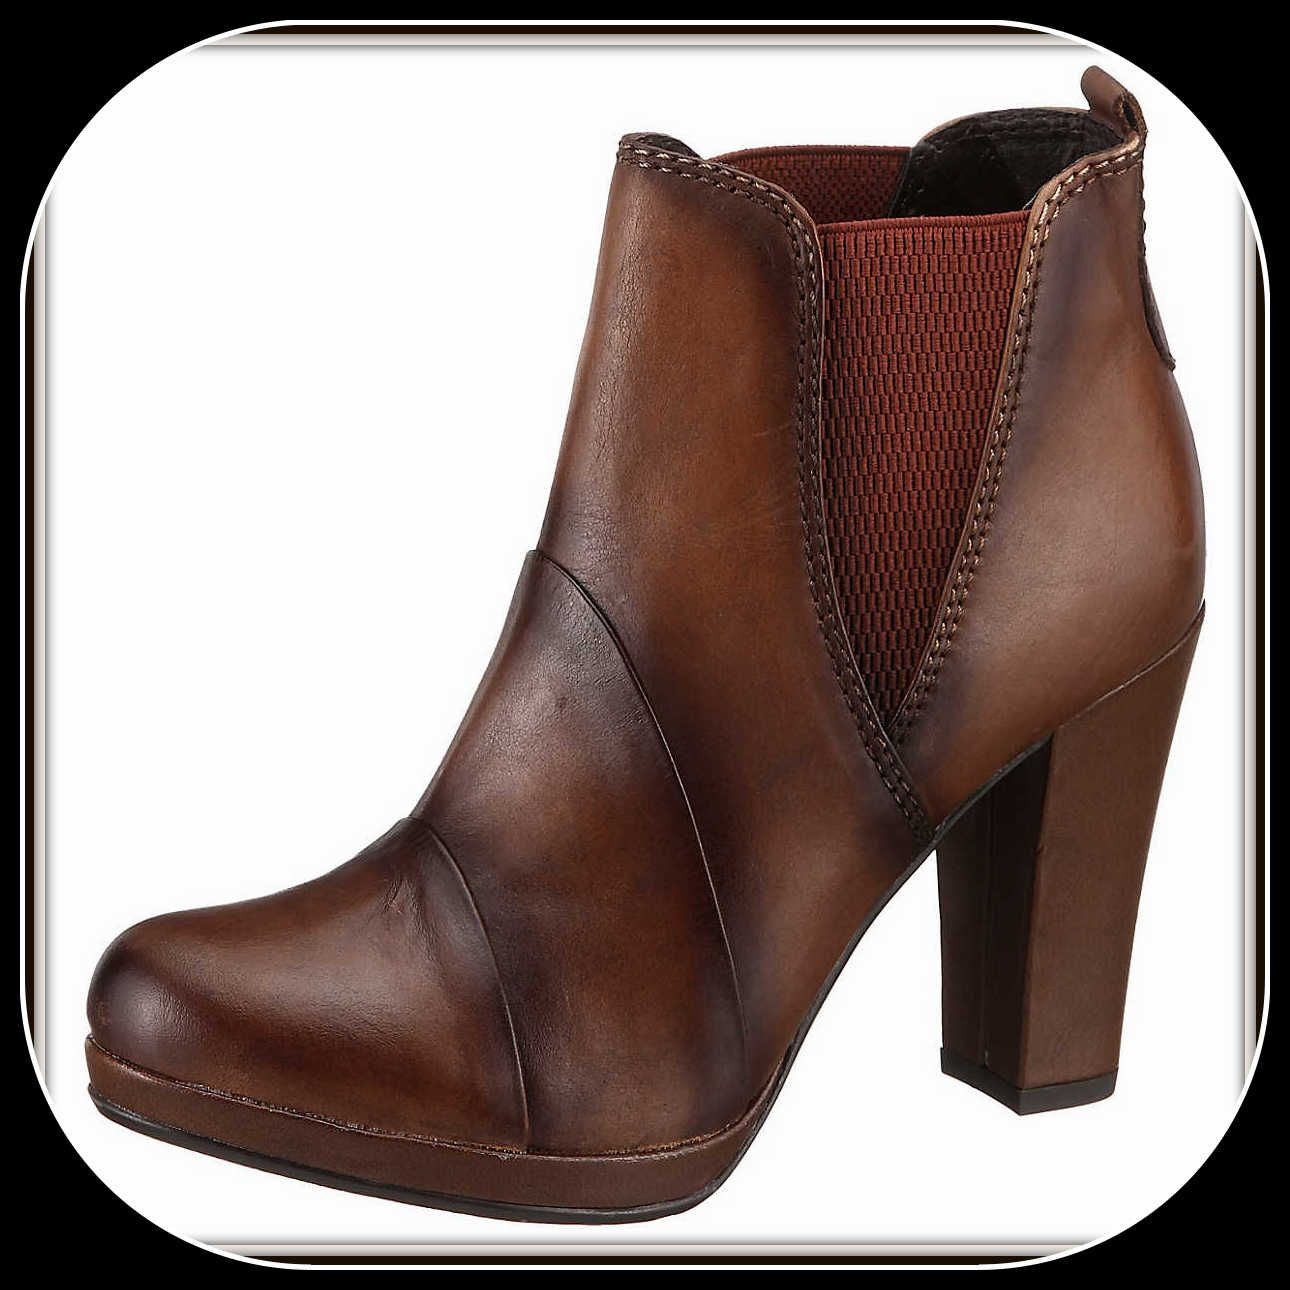 Marco Tozzi ~ Schuhe,Taschen Online Günstig Verkauf DE